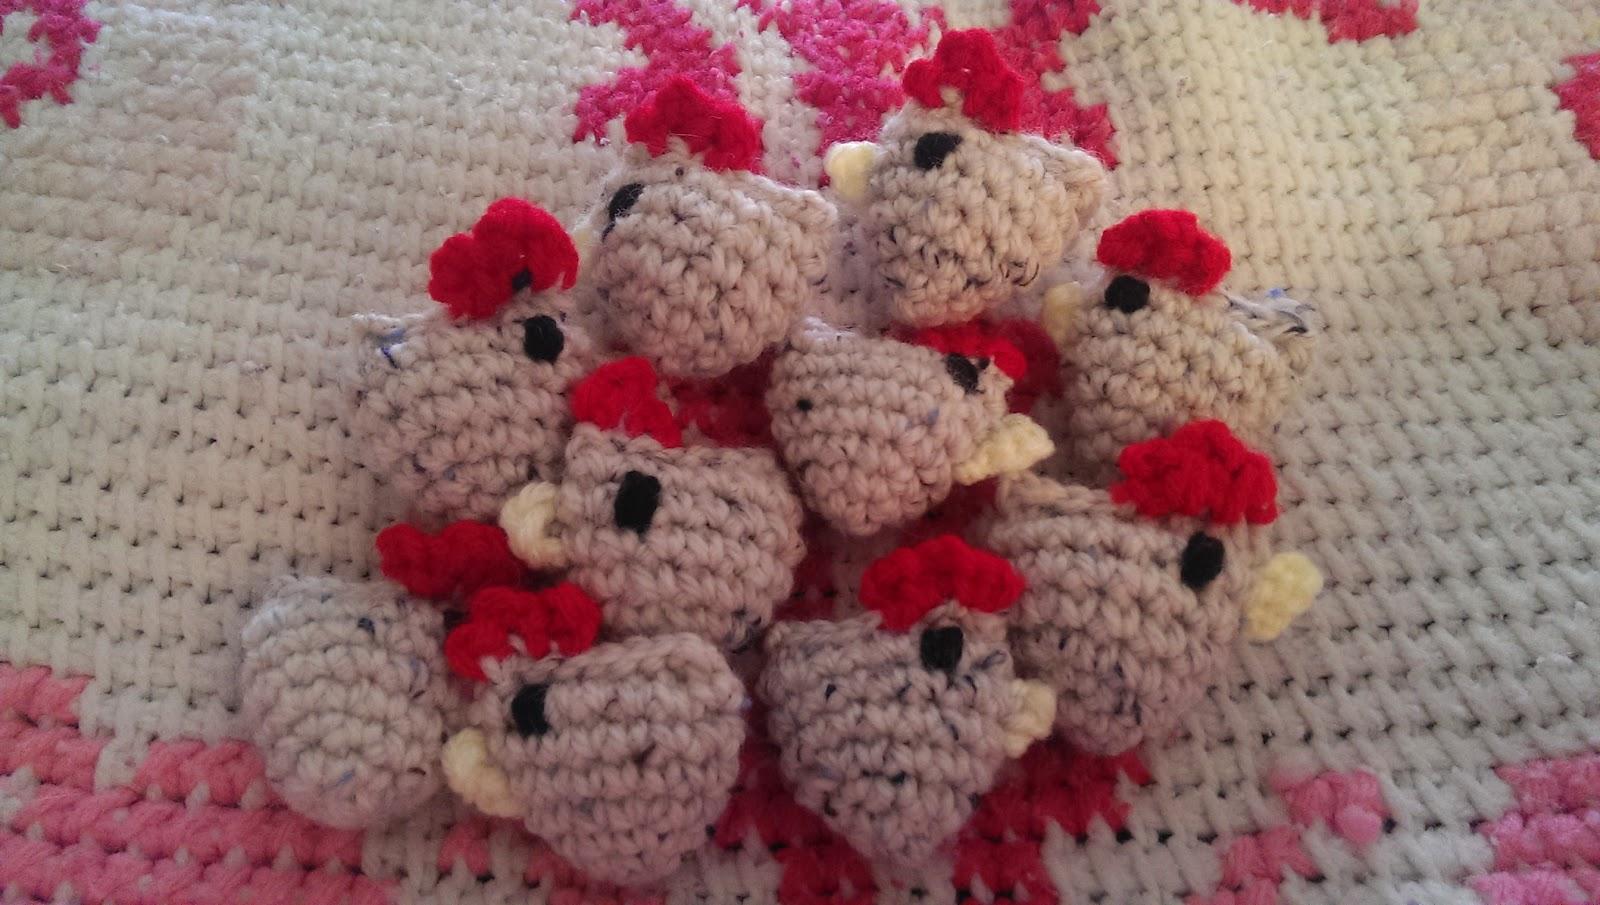 Catty Crochet: Tiny Chickens Pattern